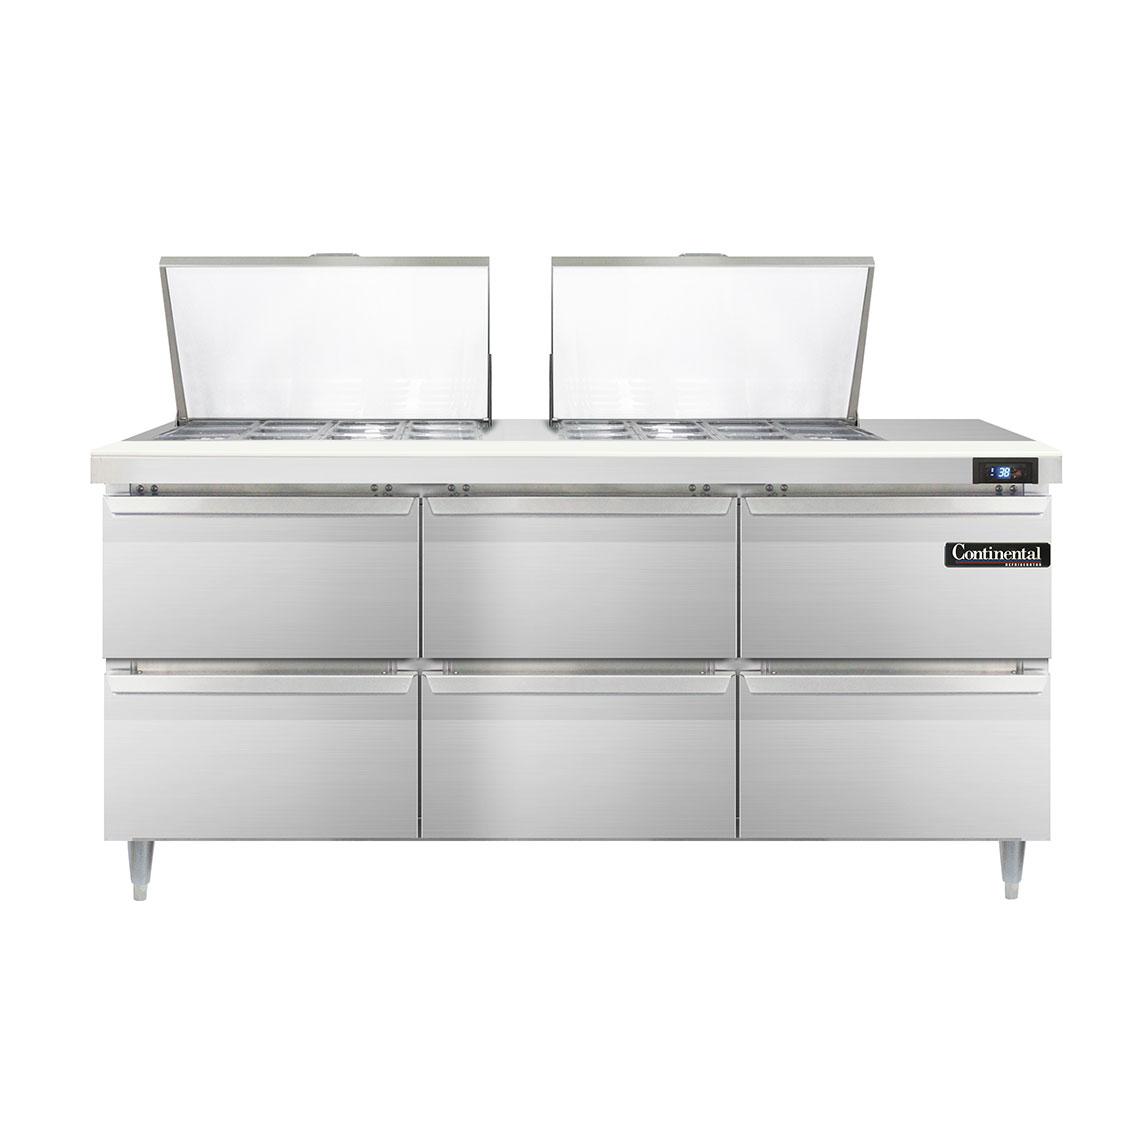 Continental Refrigerator DL72-24M-D refrigerated counter, mega top sandwich / salad unit